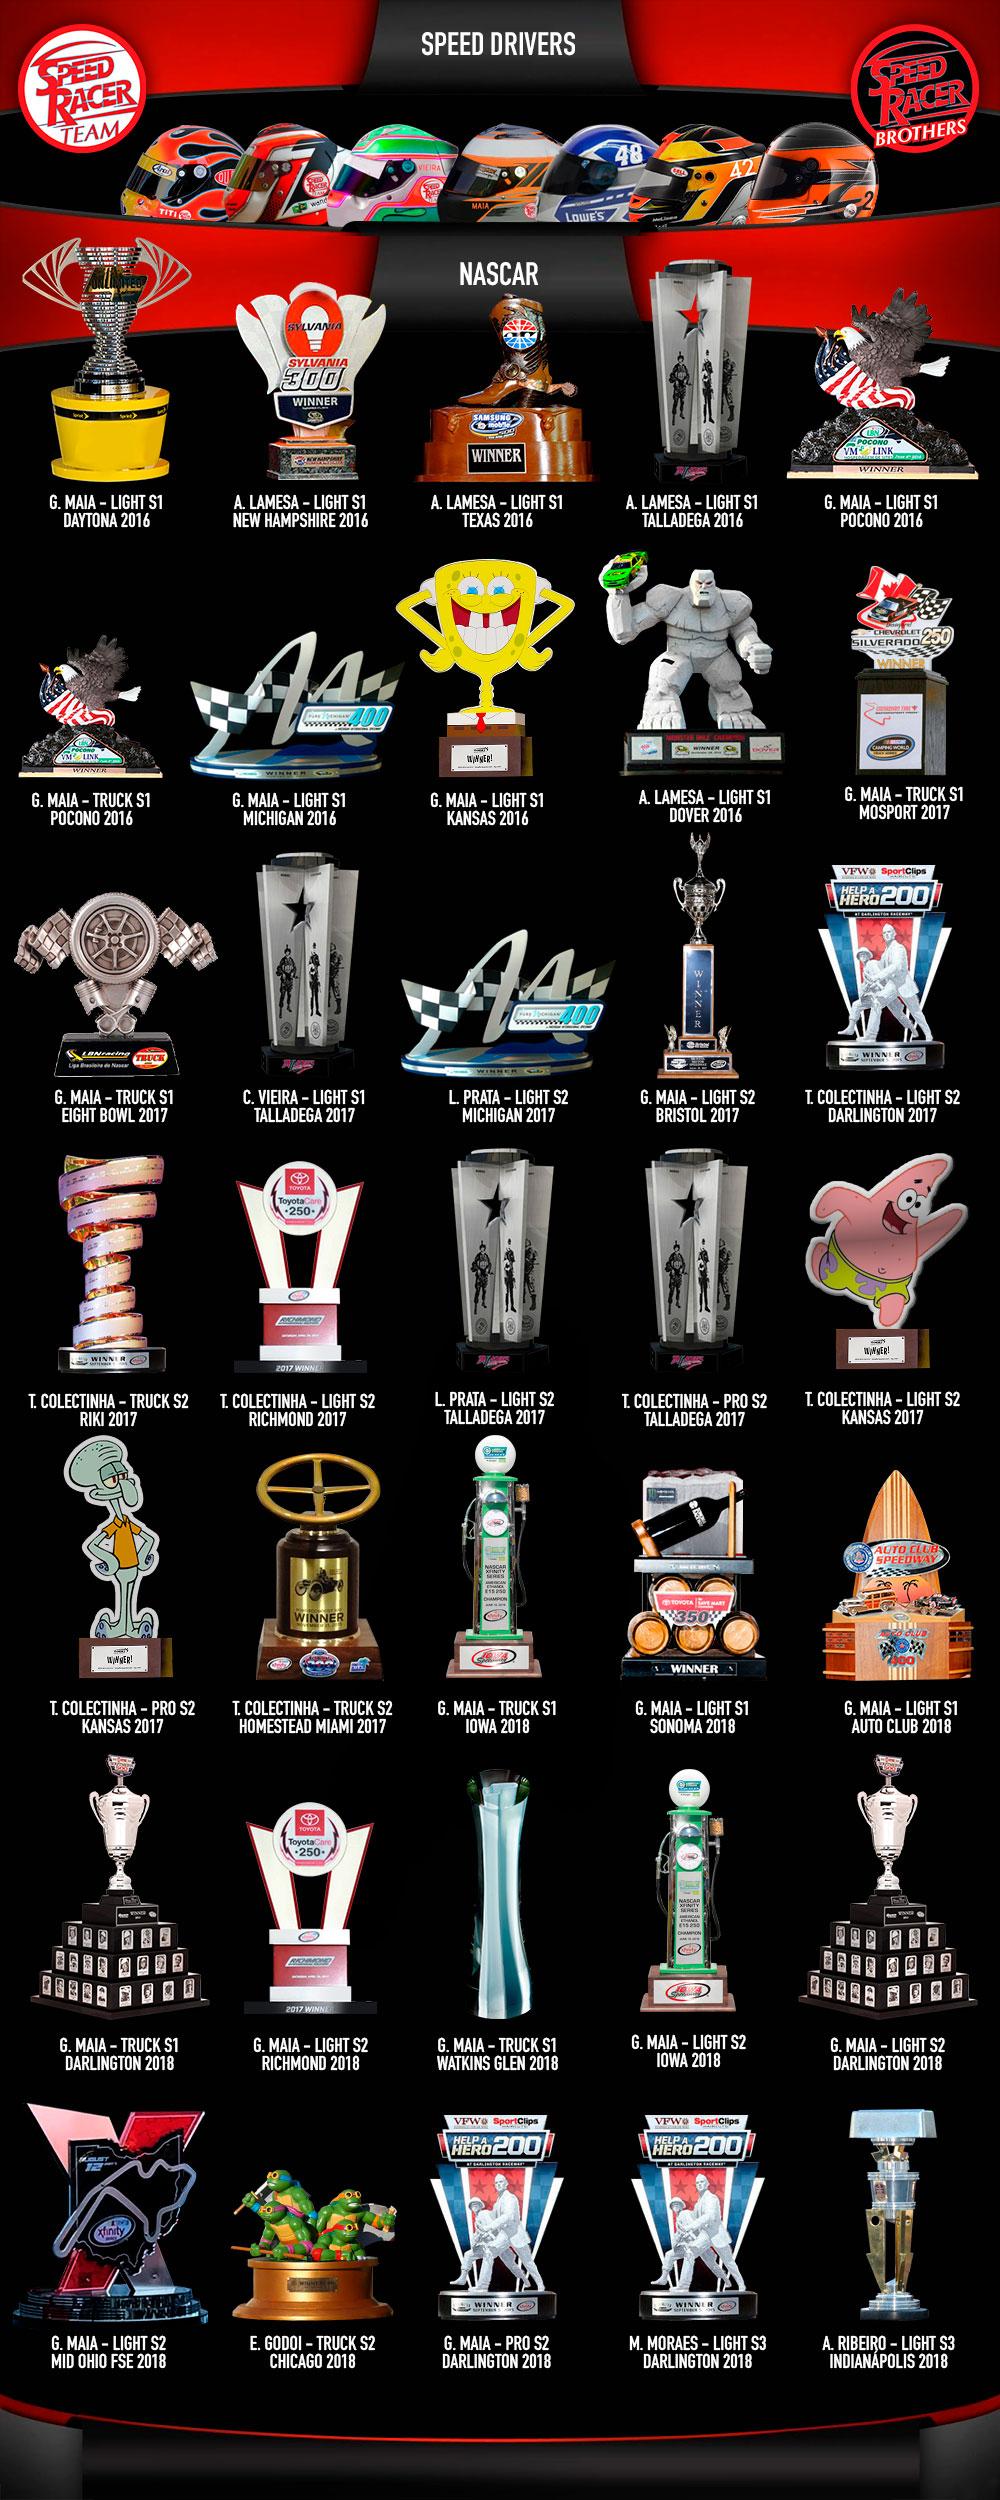 trophy-2.0-NASCAR.jpg?1538745772